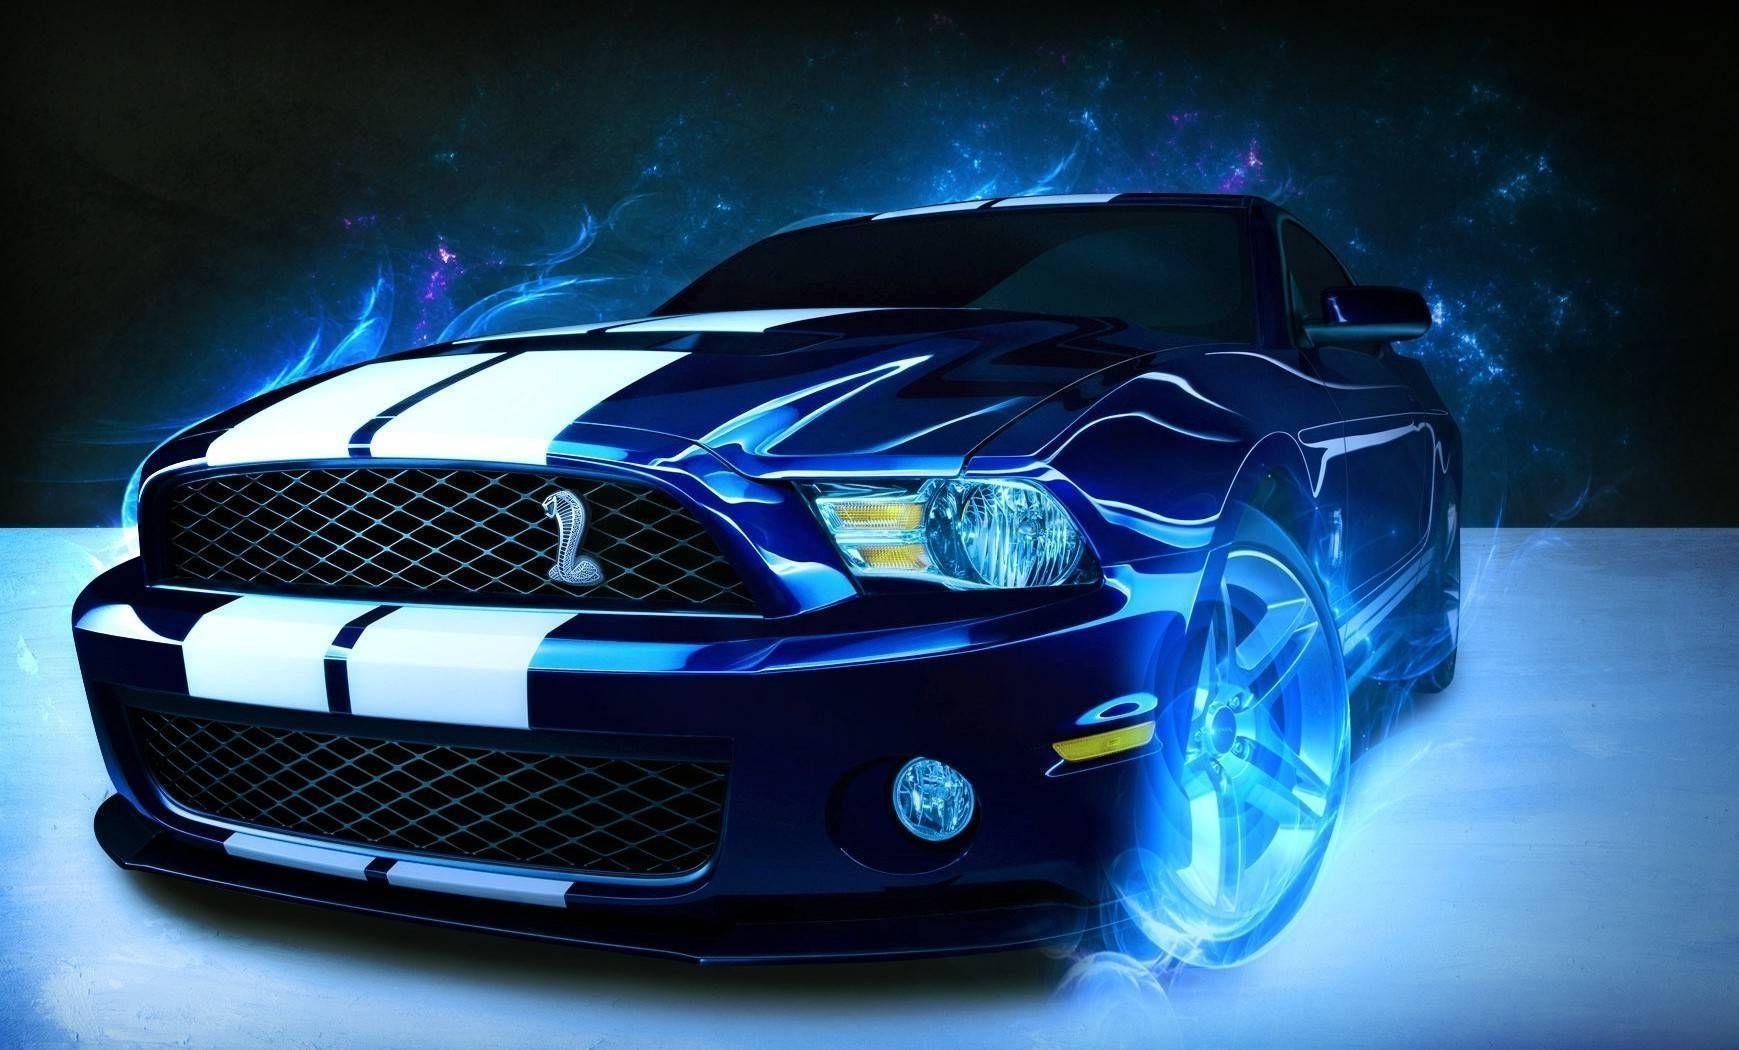 Registrant Whois Contact Information Verification Mustang Wallpaper Ford Mustang Wallpaper Mustang